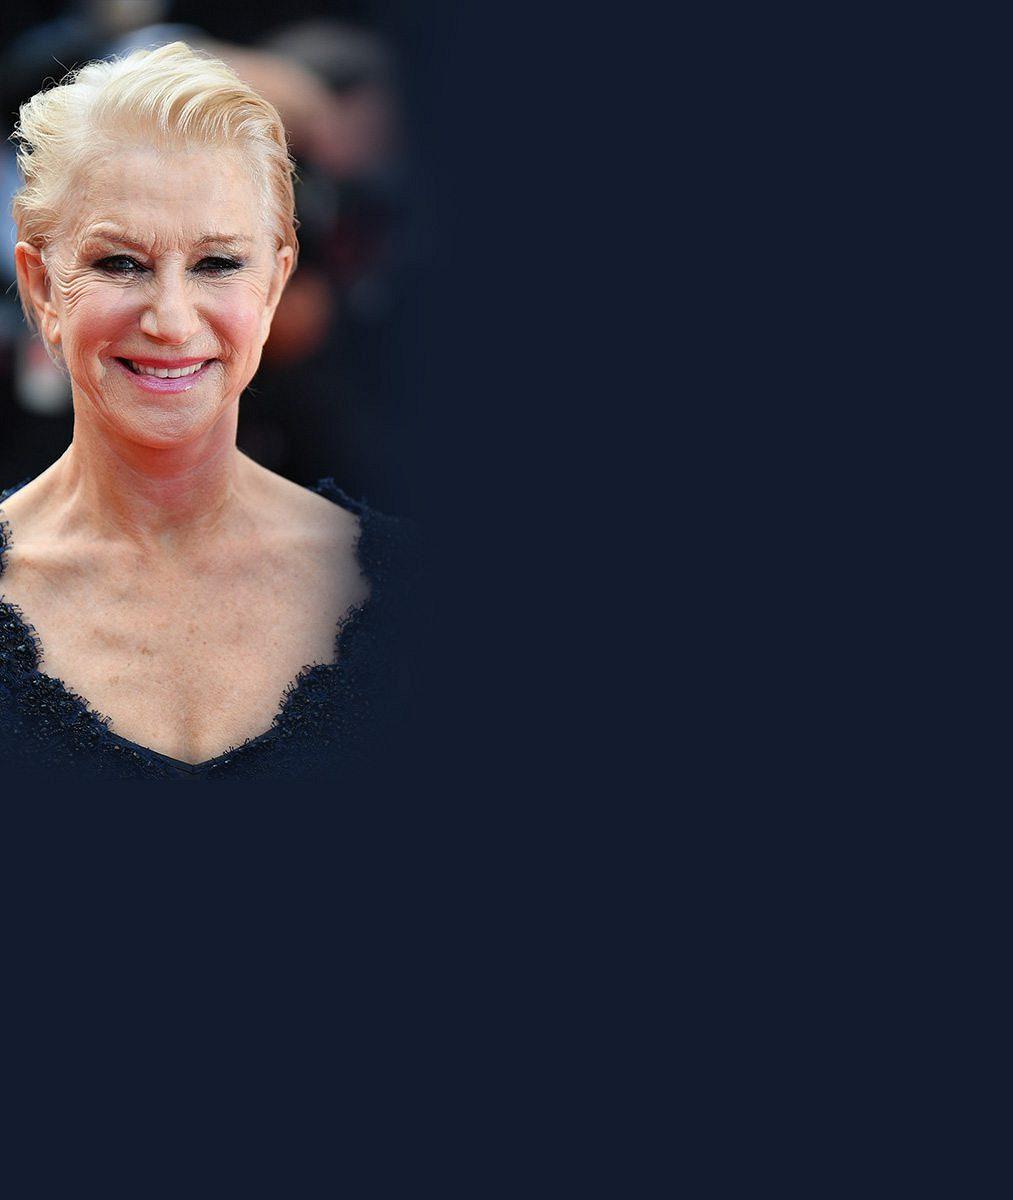 Aj ta krajta. Hellen Mirren (70) upadla na schodech v Cannes